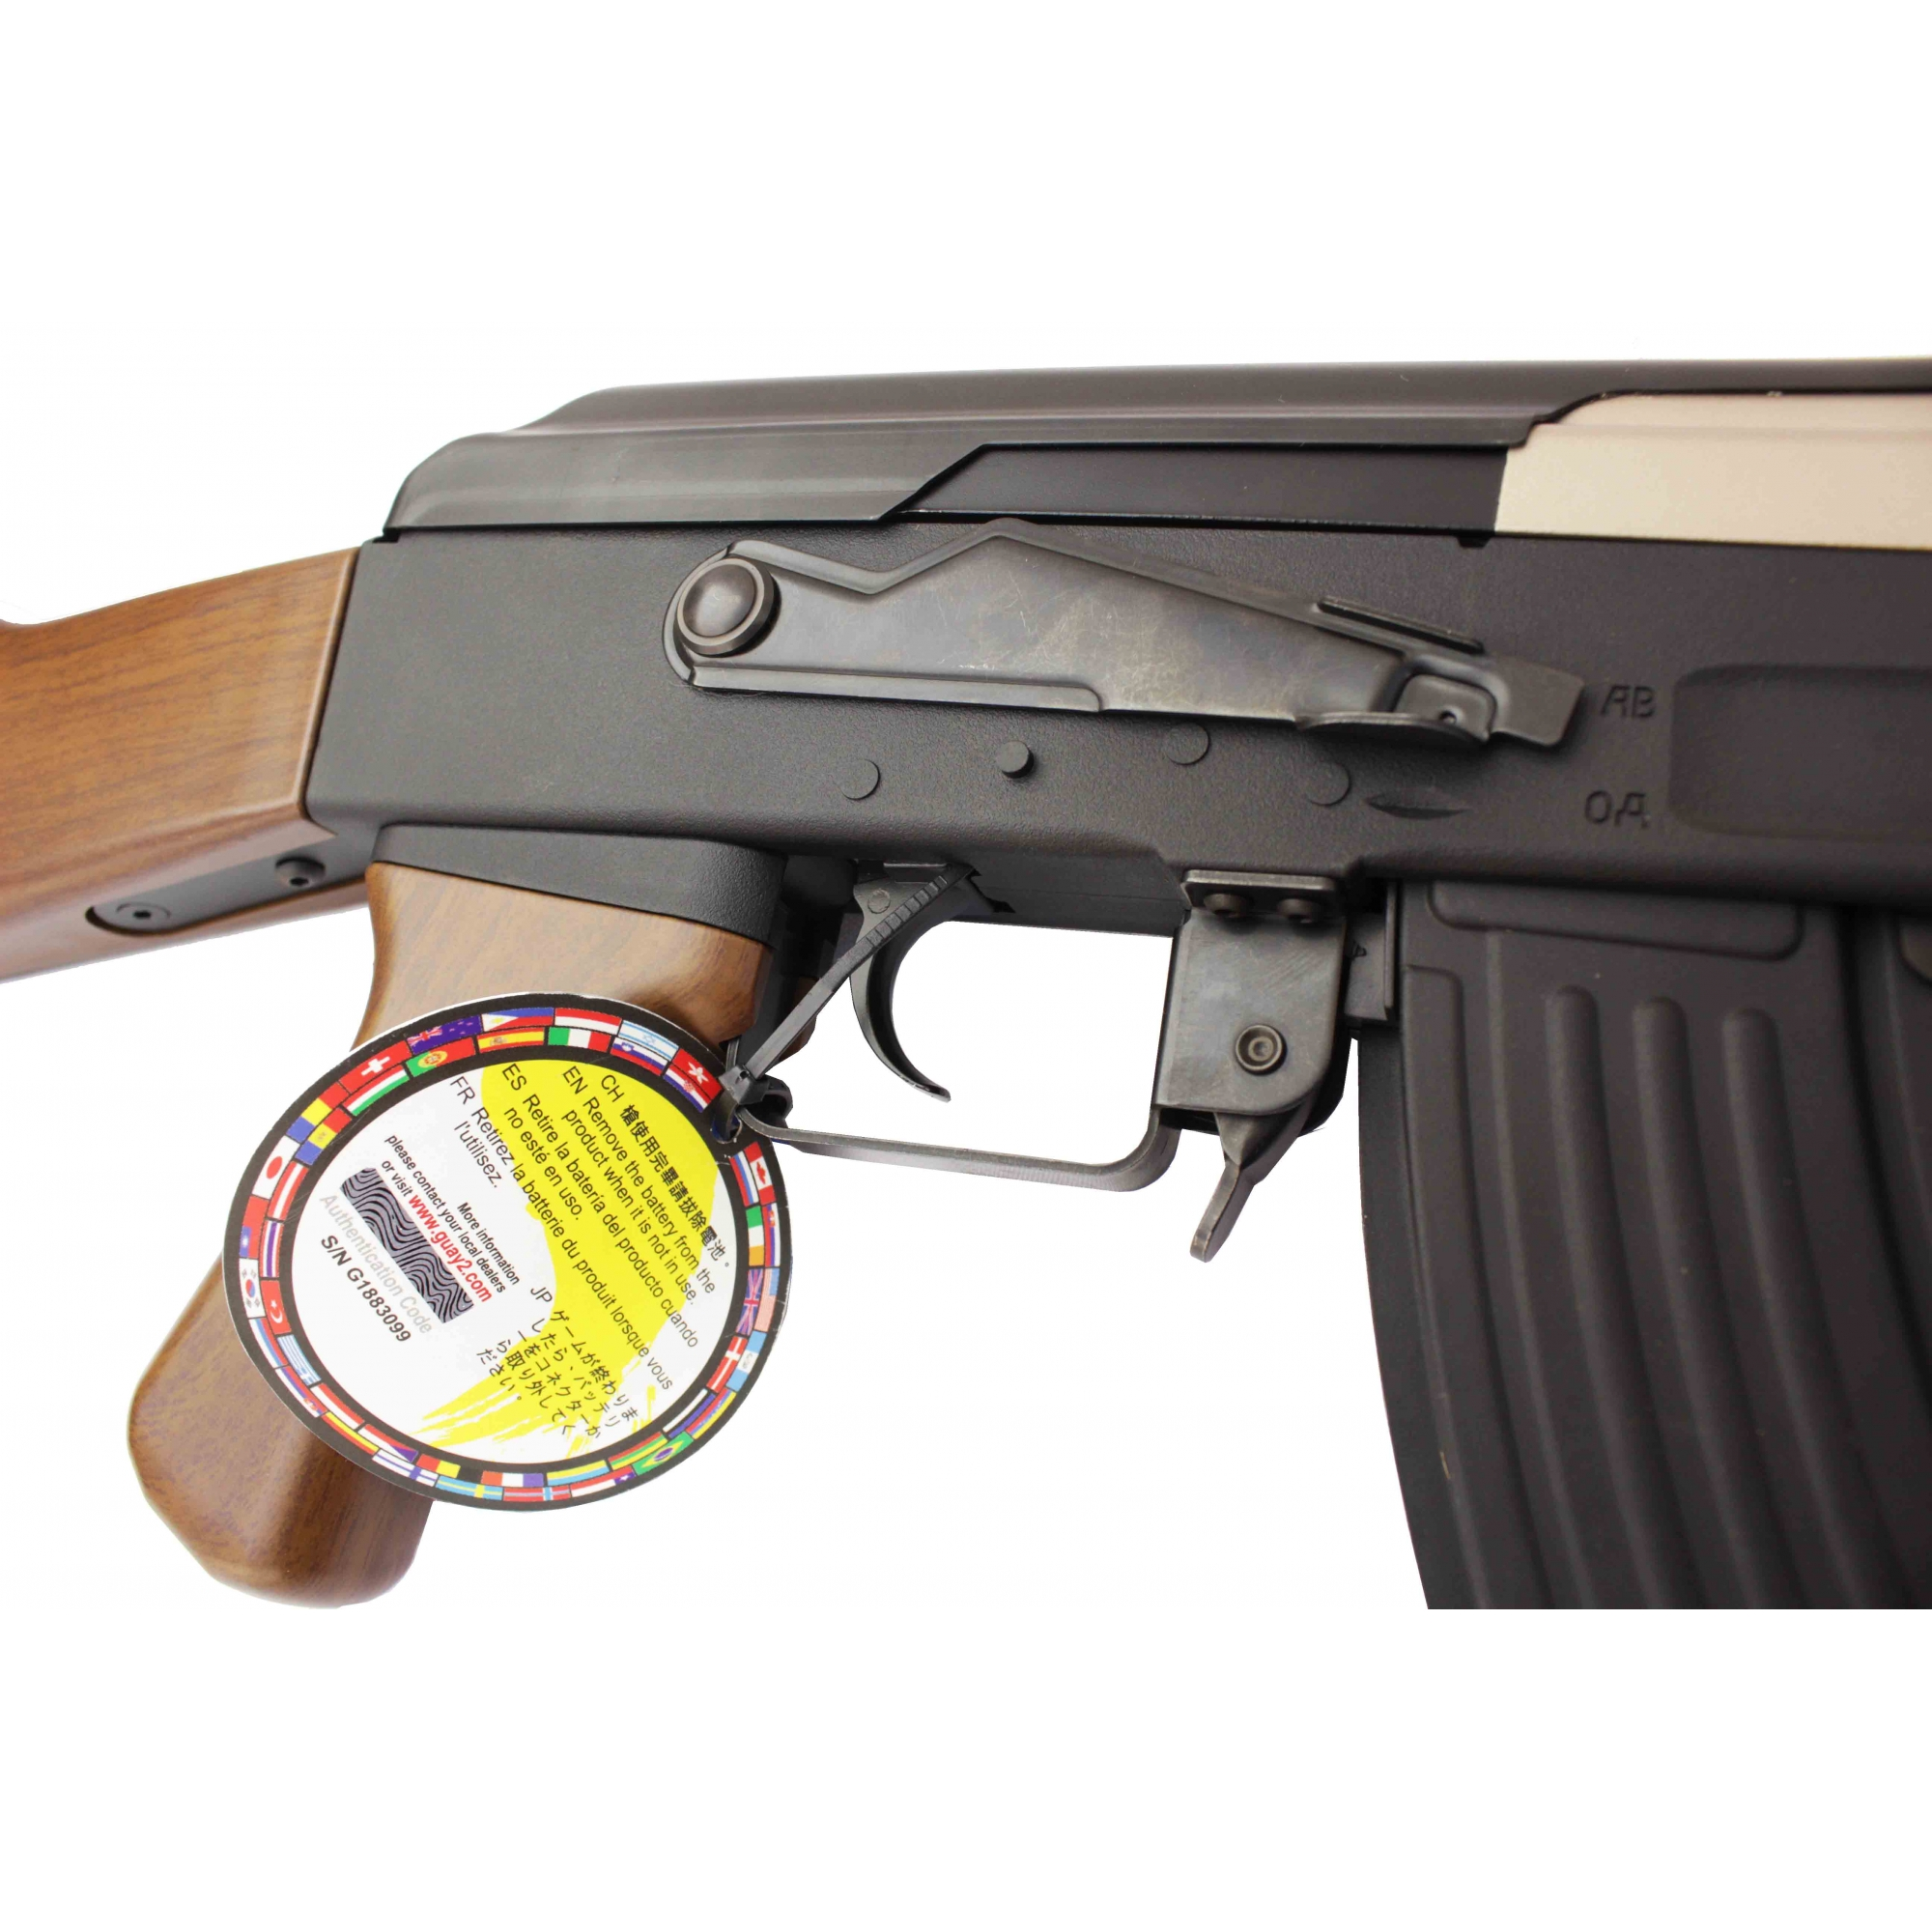 Rifle Airsoft G&G AK47 RK47 Imitation Wood